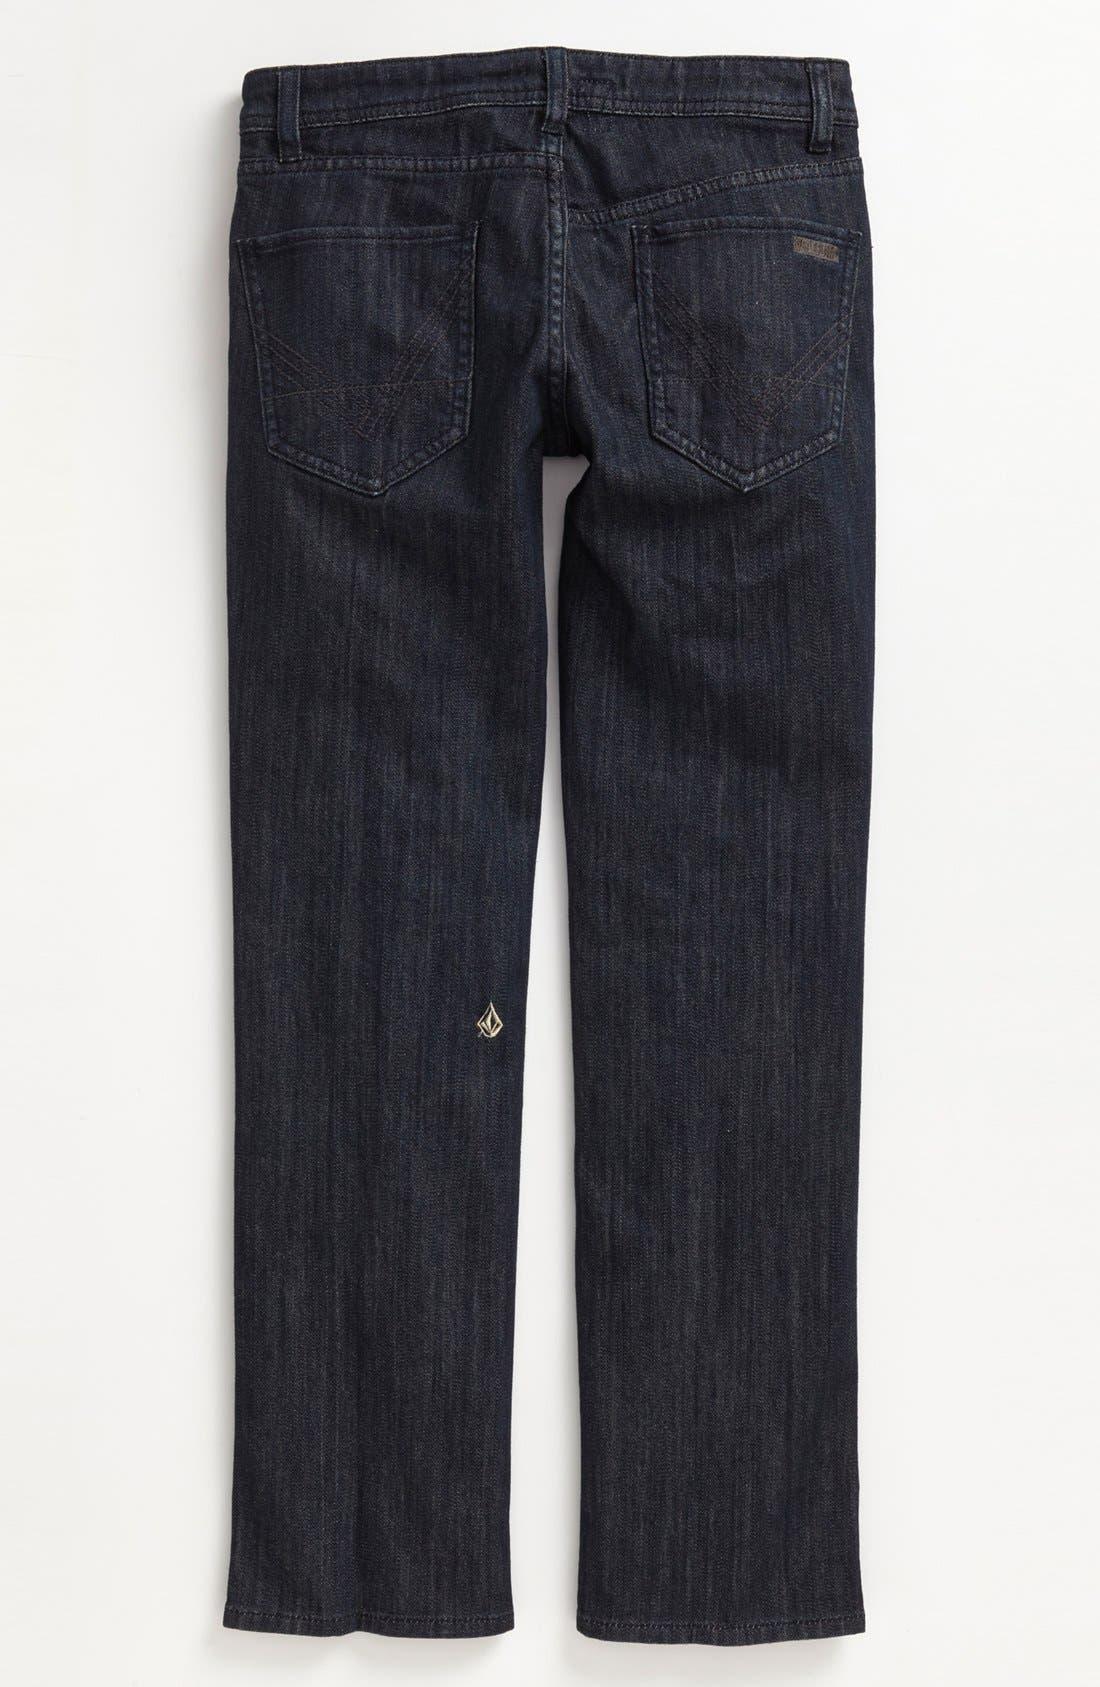 Alternate Image 1 Selected - Volcom 'Nova' Straight Leg Jeans (Big Boys)